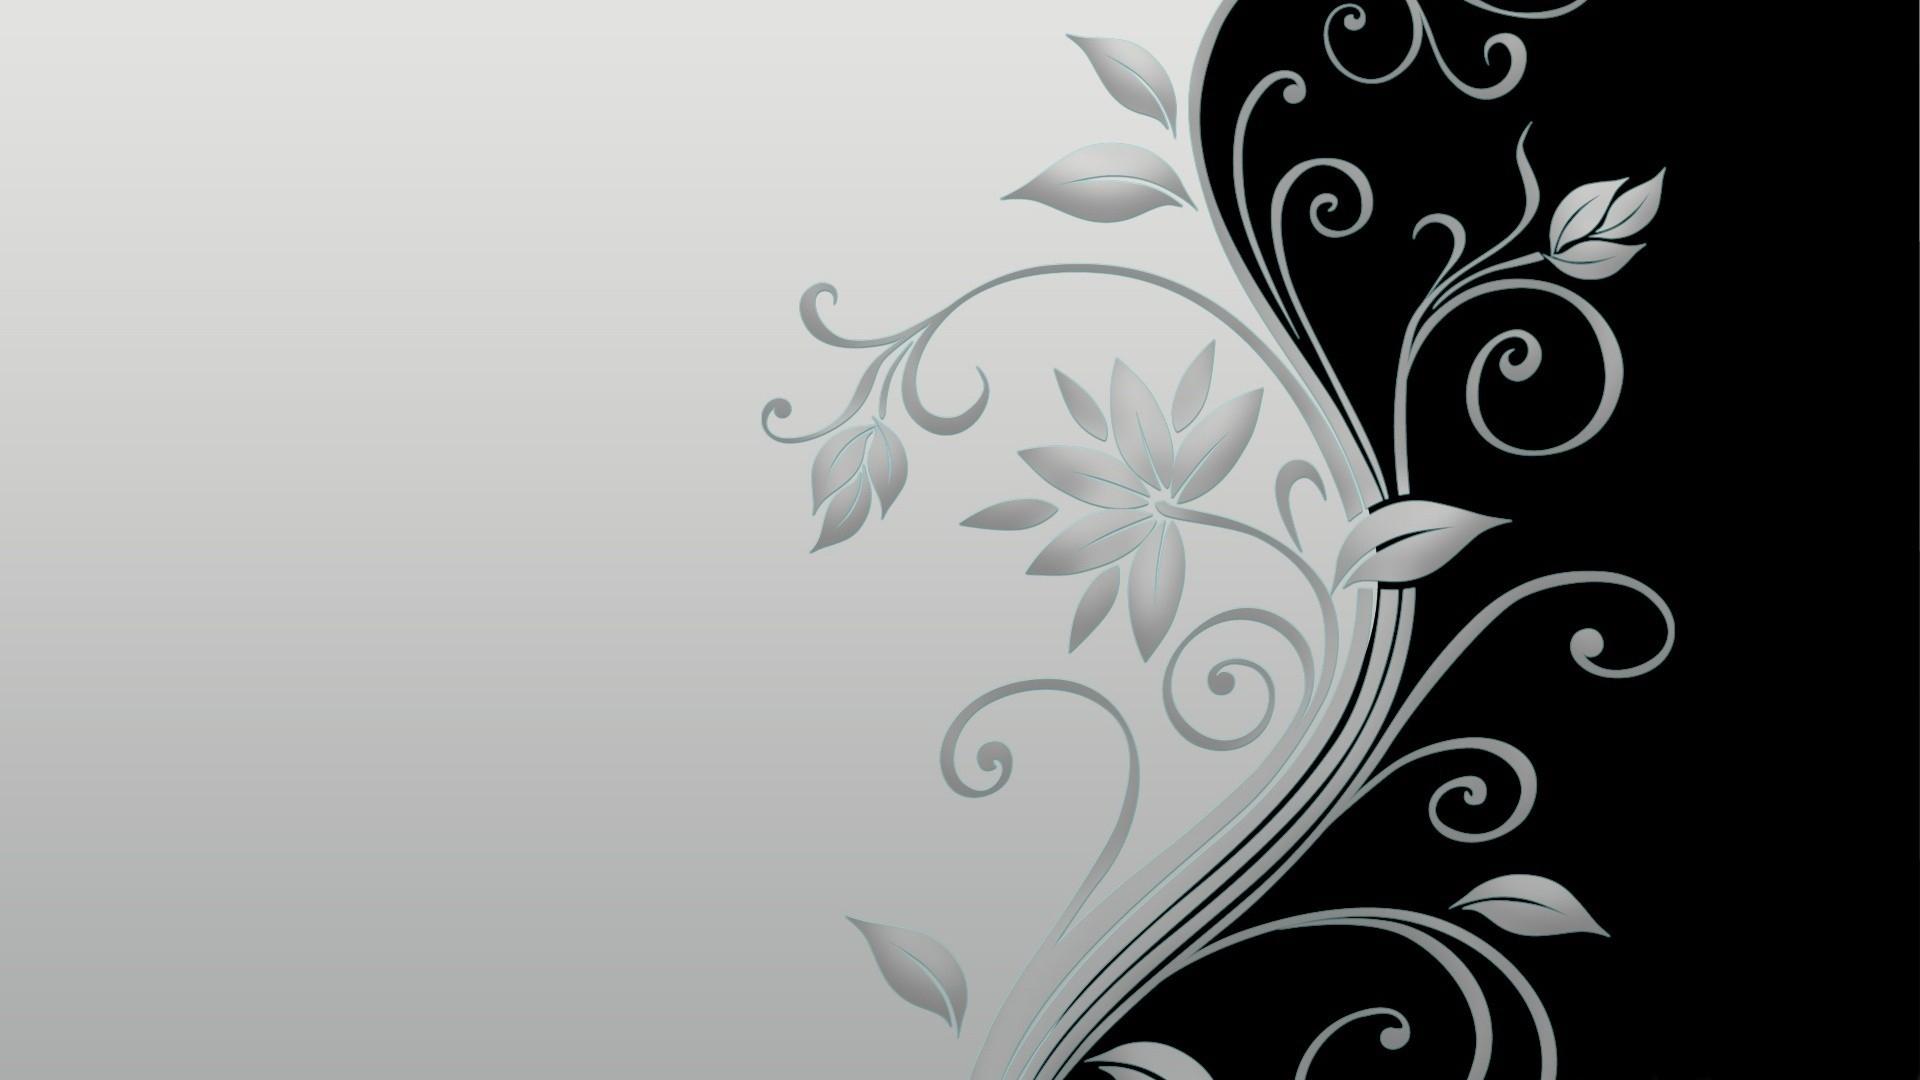 White Flower Wallpaper Cubewallpapercom High and Black